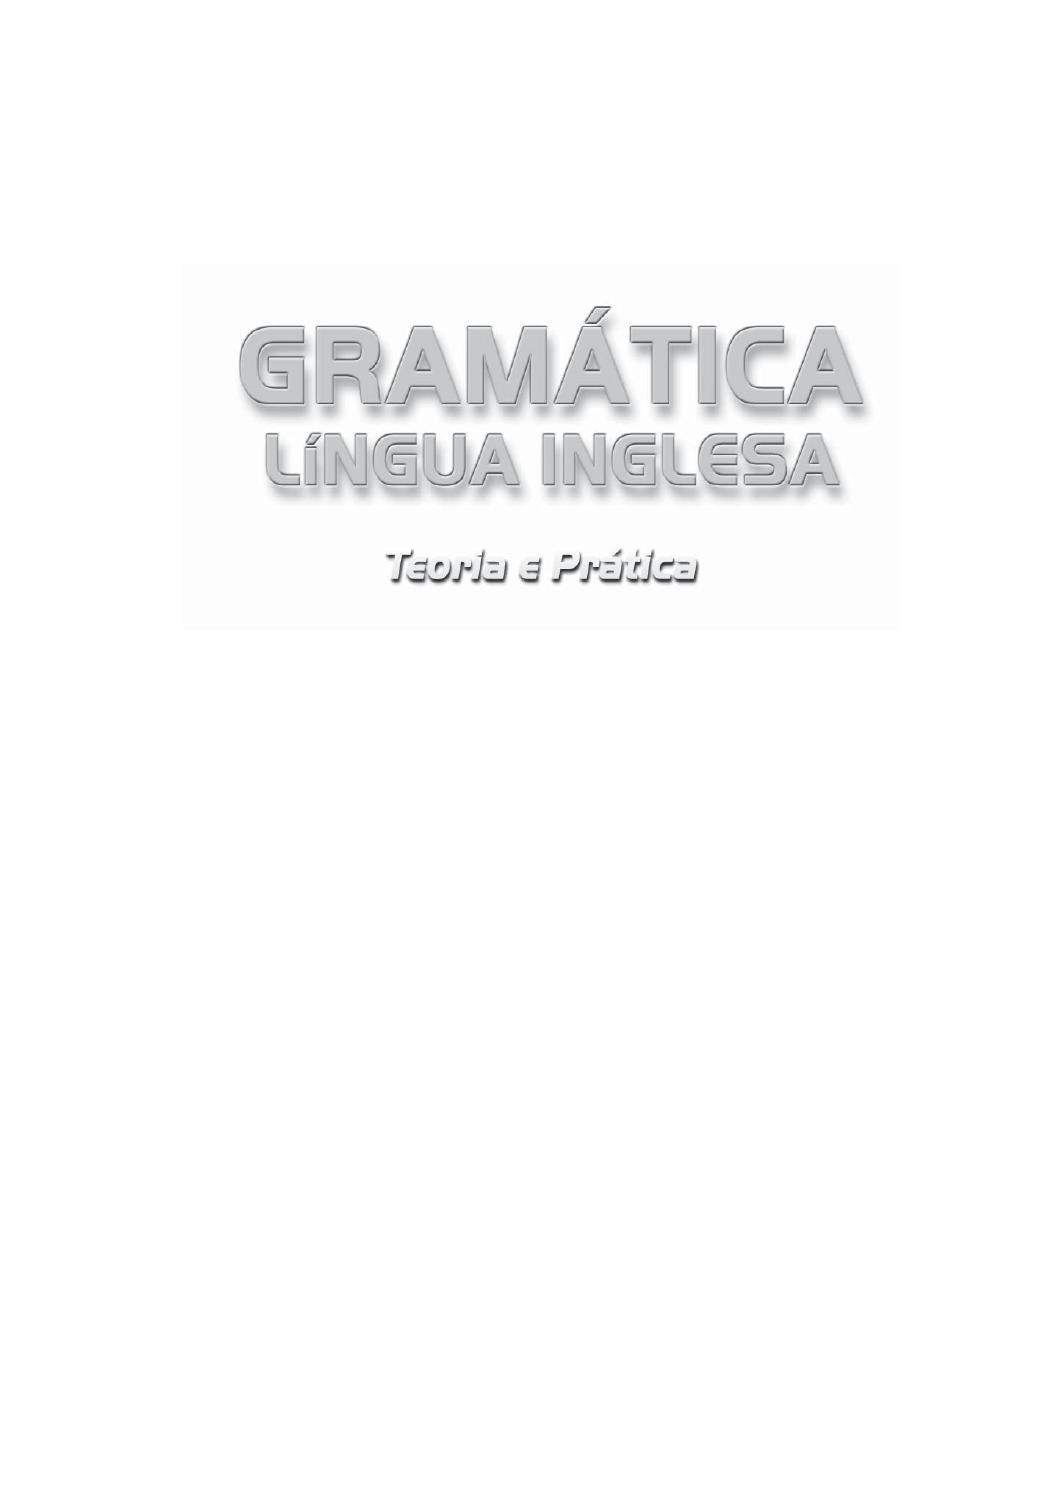 Linguainglesa by bella santana issuu fandeluxe Images